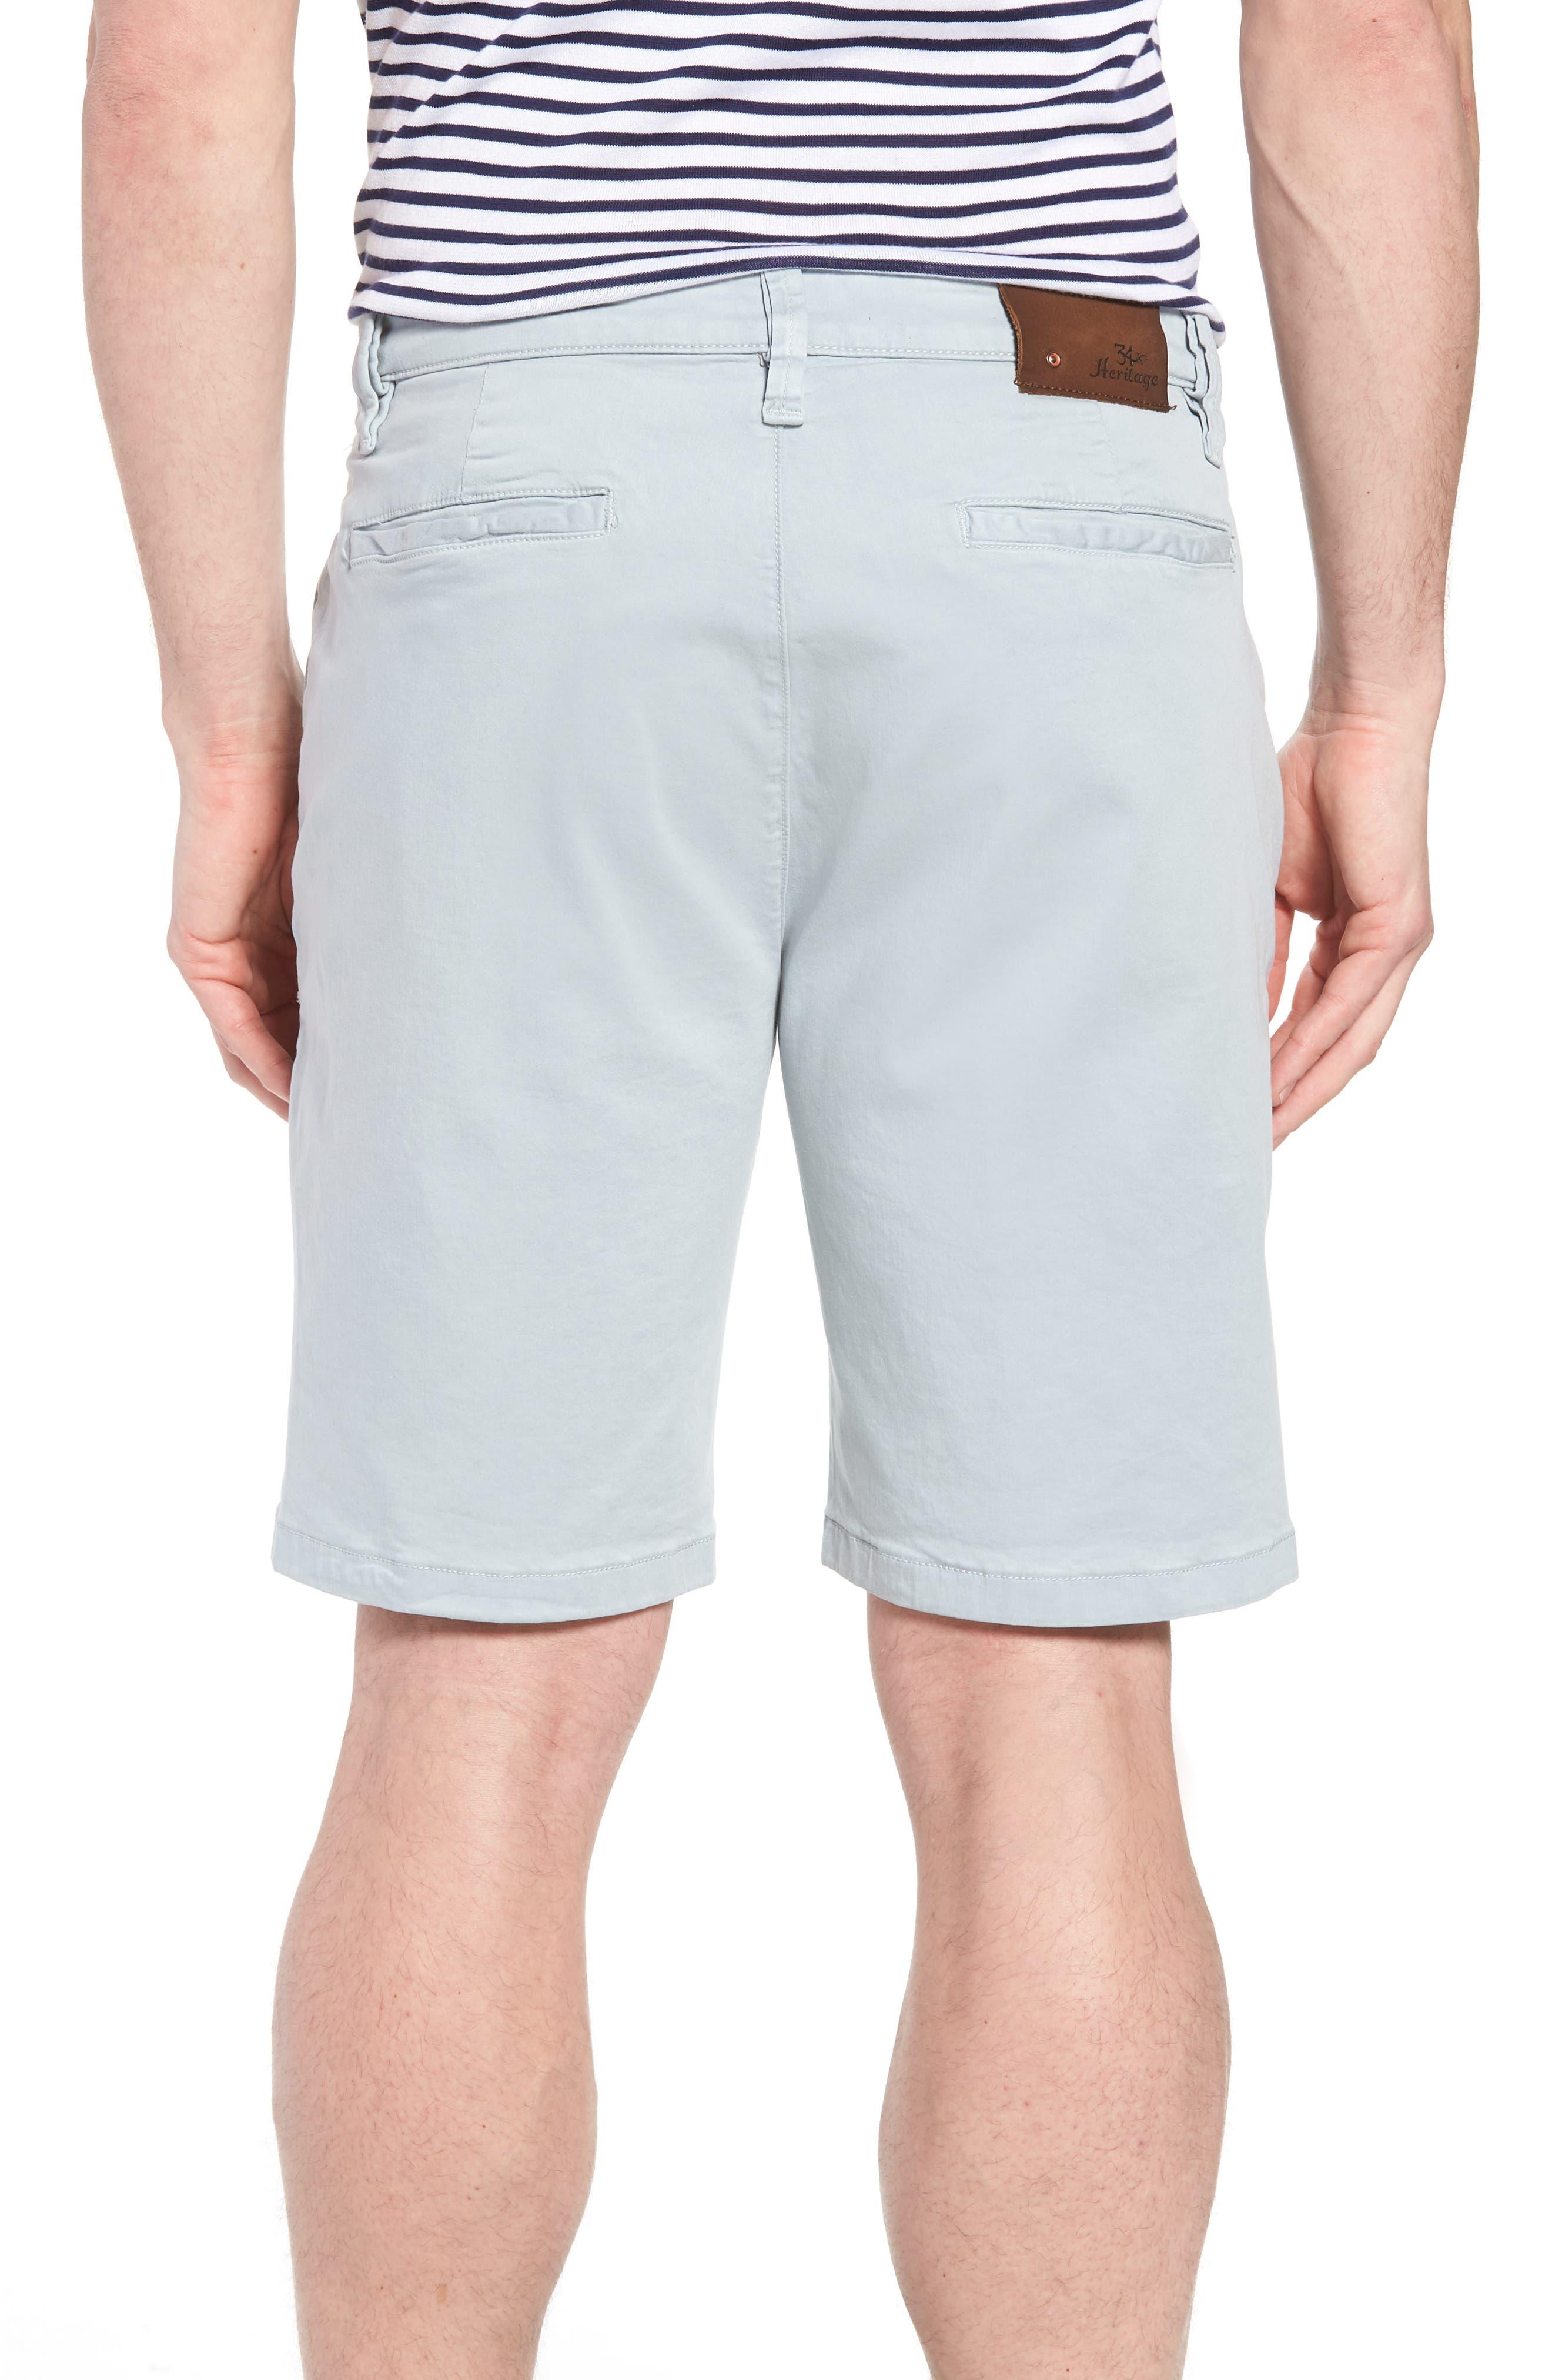 Nevada Twill Shorts,                             Alternate thumbnail 2, color,                             ICE TWILL